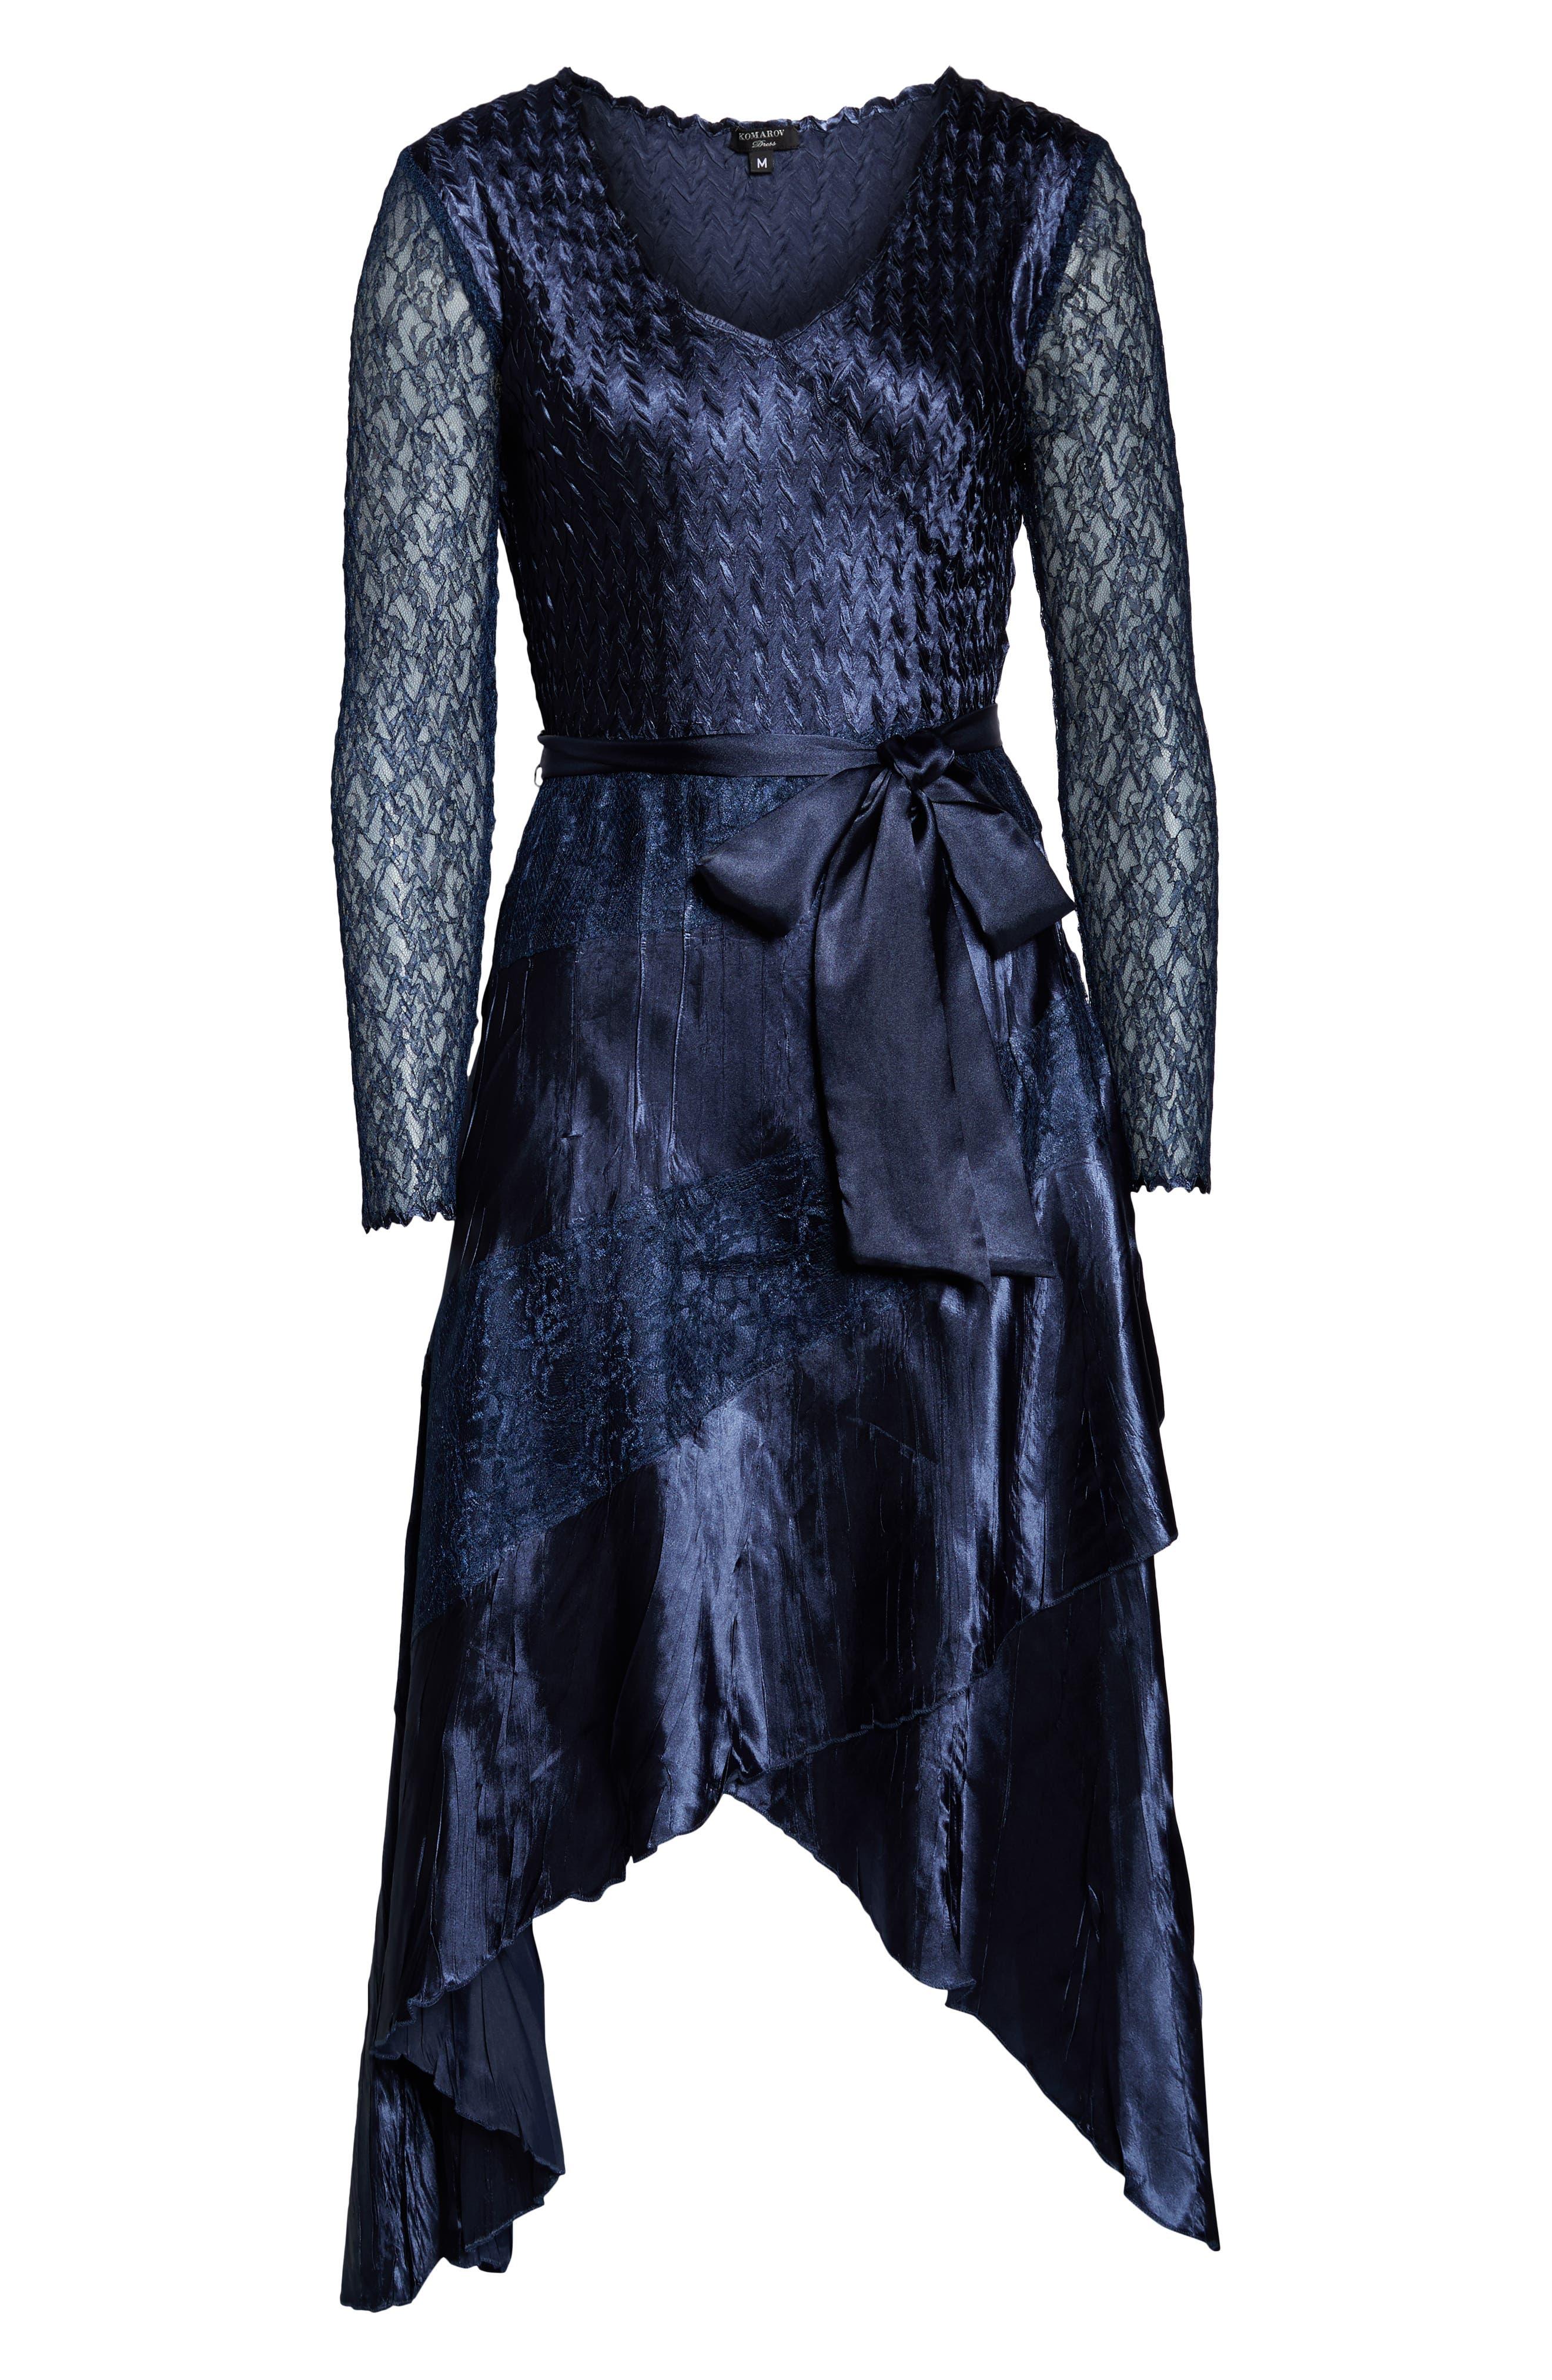 KOMAROV, Charmeuse & Chiffon High/Low Hem Dress, Alternate thumbnail 5, color, ECLIPSE